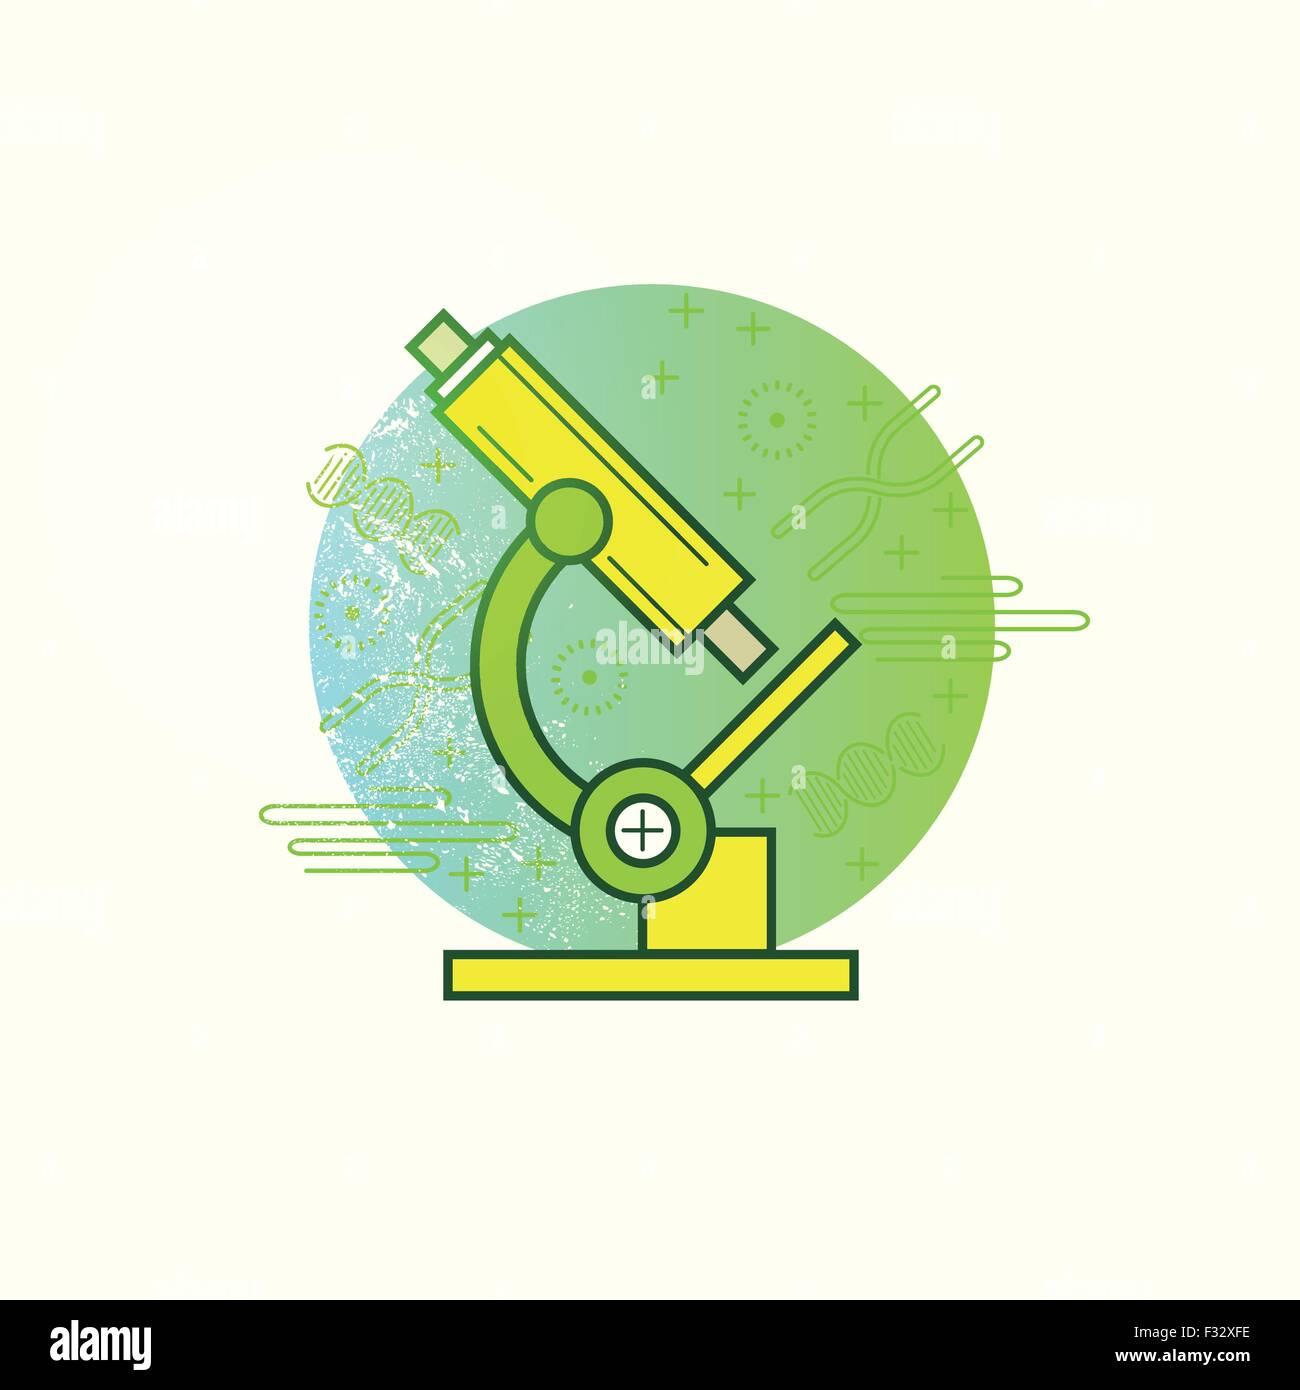 Vecteur de microscope. Une science biologie microscope sur un arrière-plan. Vector illustration Photo Stock